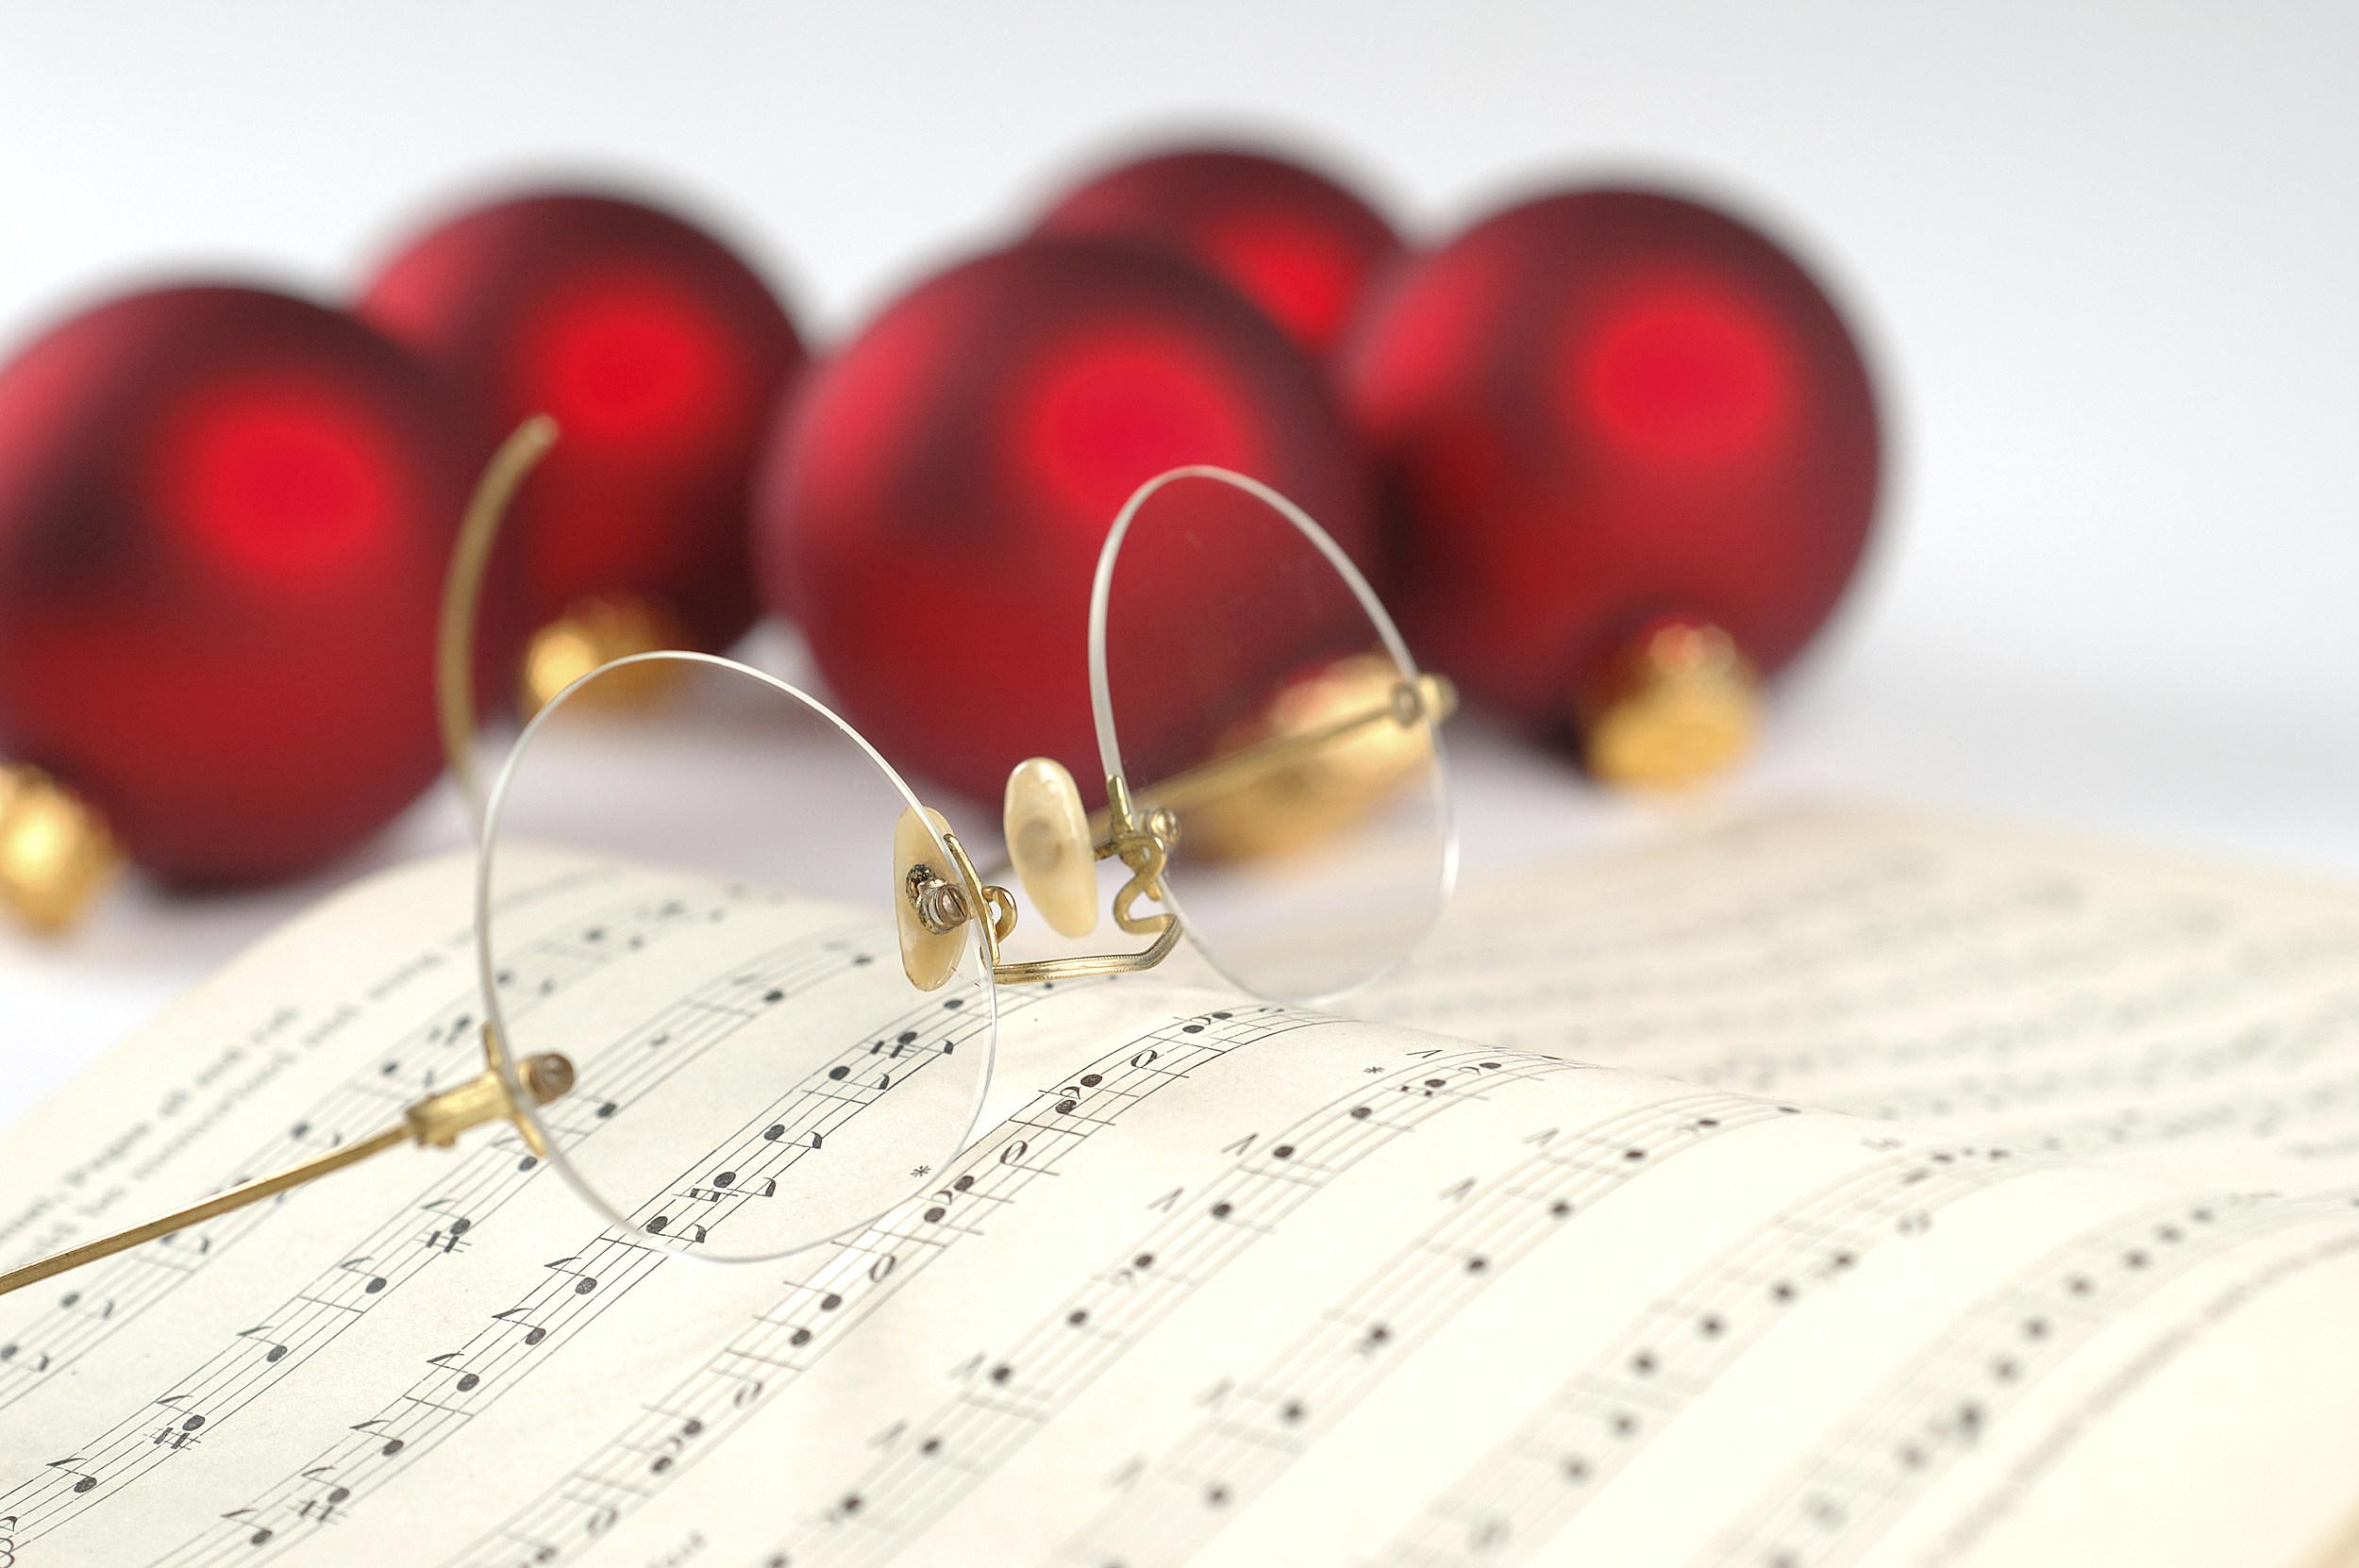 Christmas Music - 96.5 The Fox